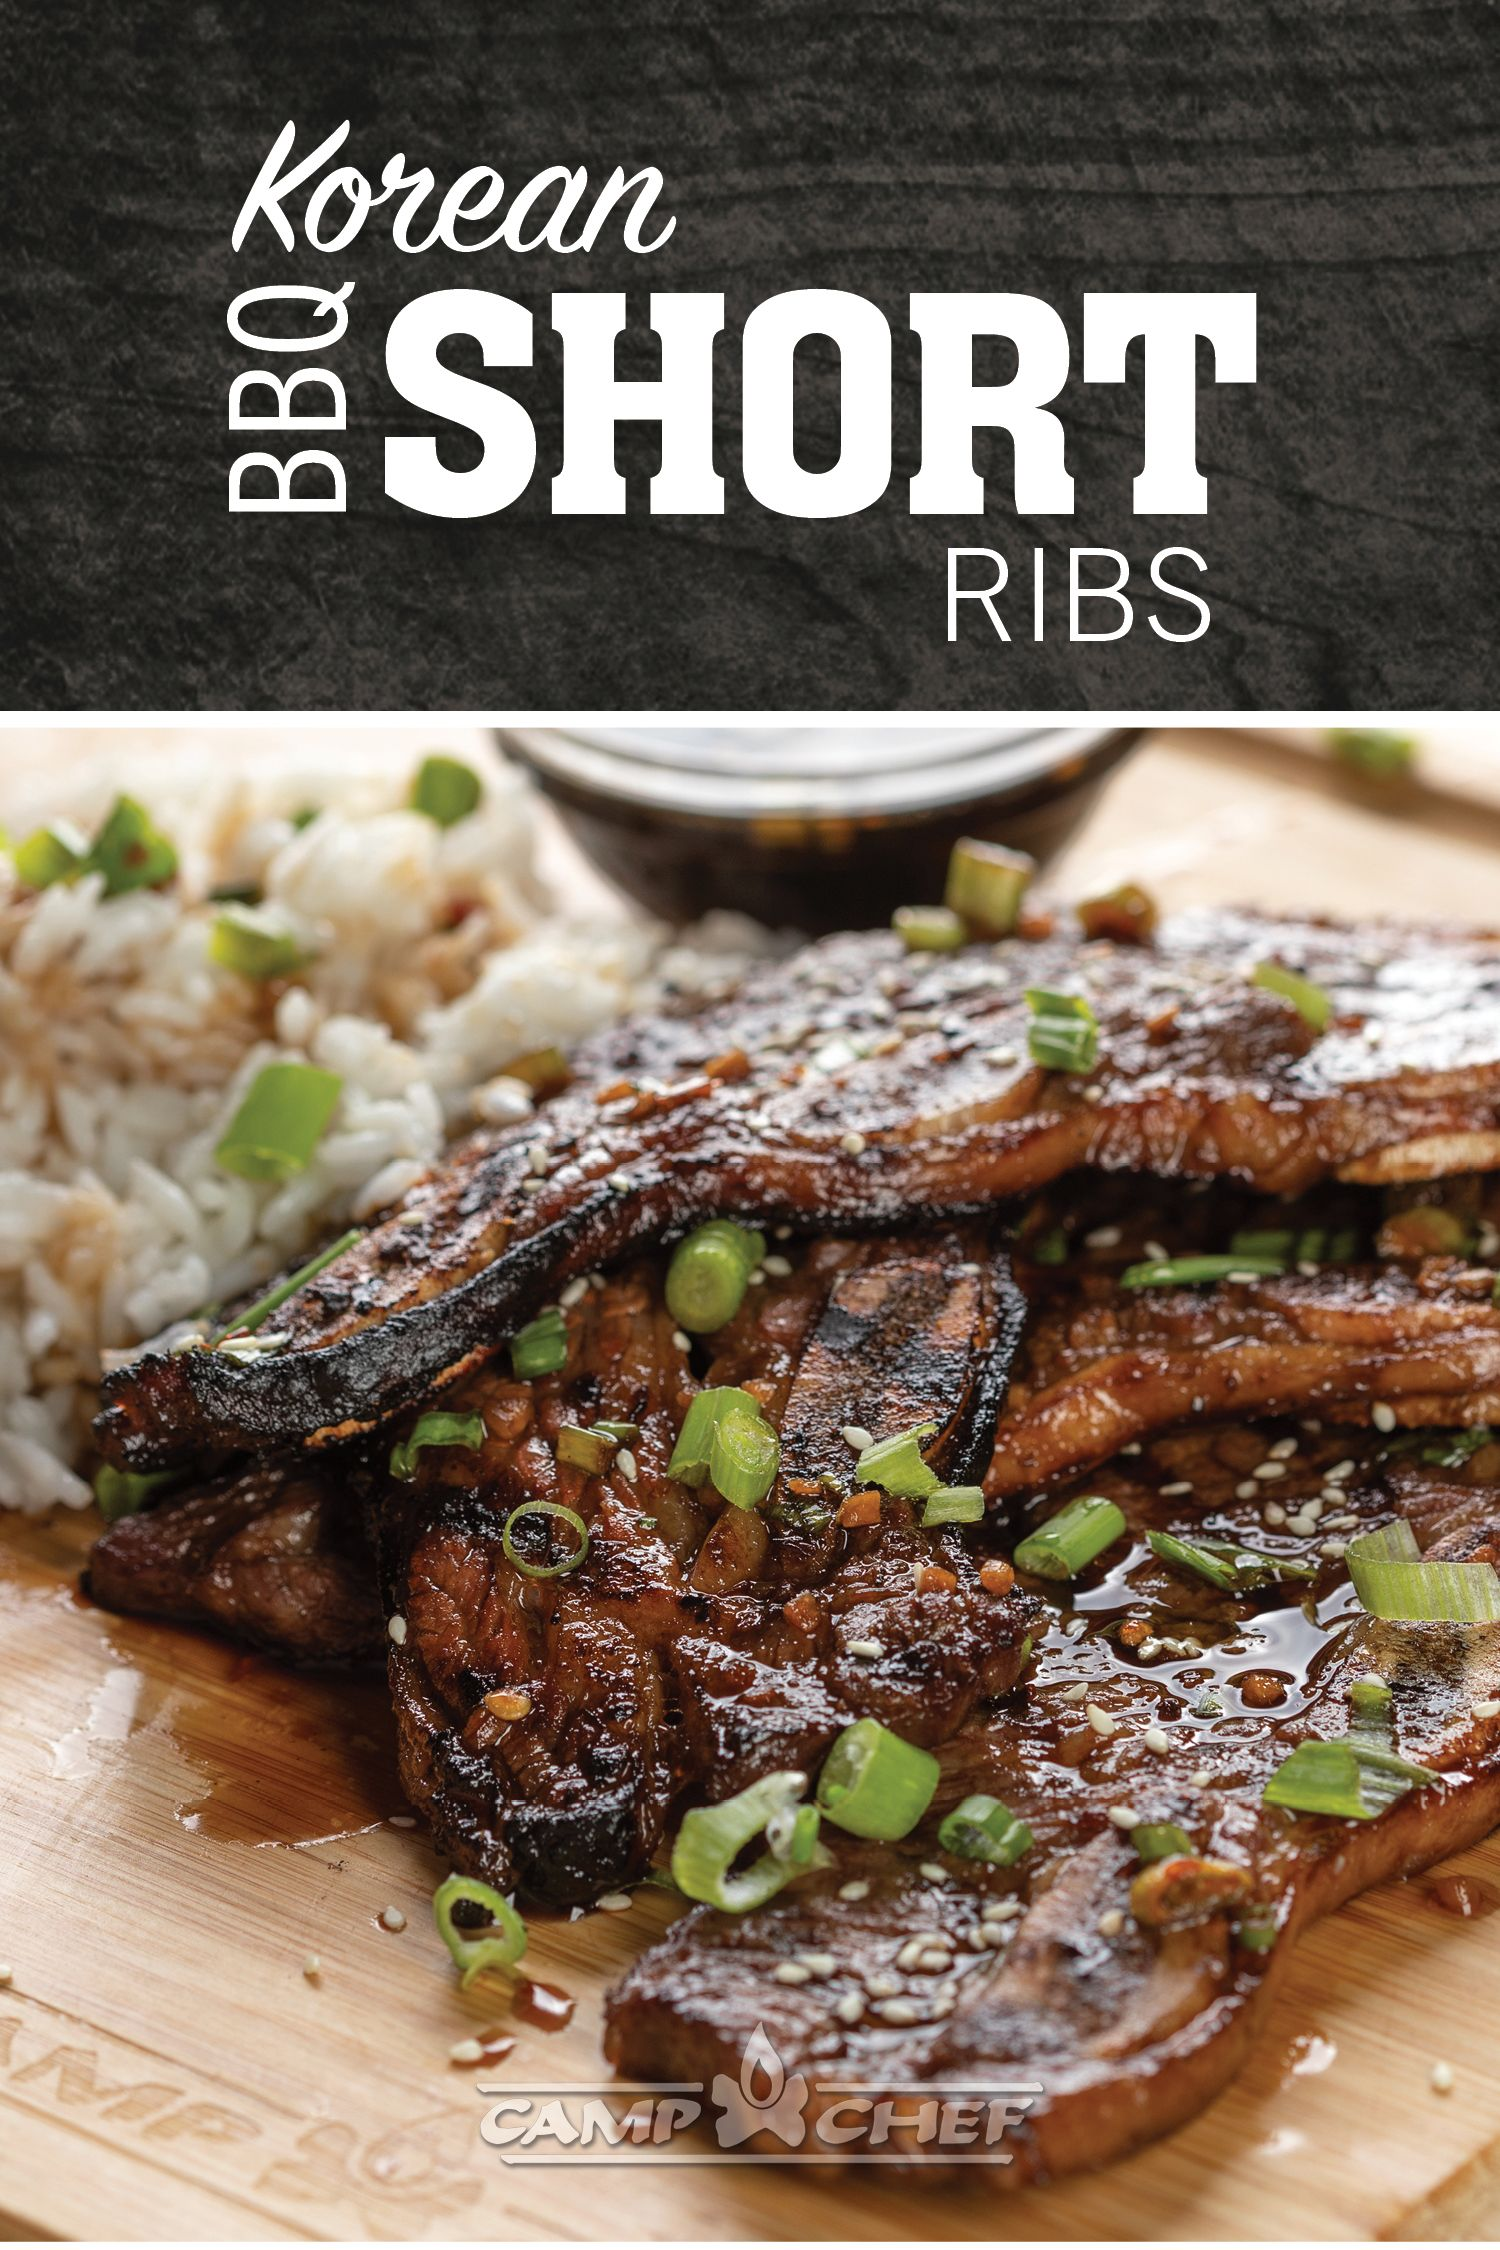 Korean Bbq Short Ribs Recipe Beef Short Rib Recipes Rib Recipes Bbq Short Ribs